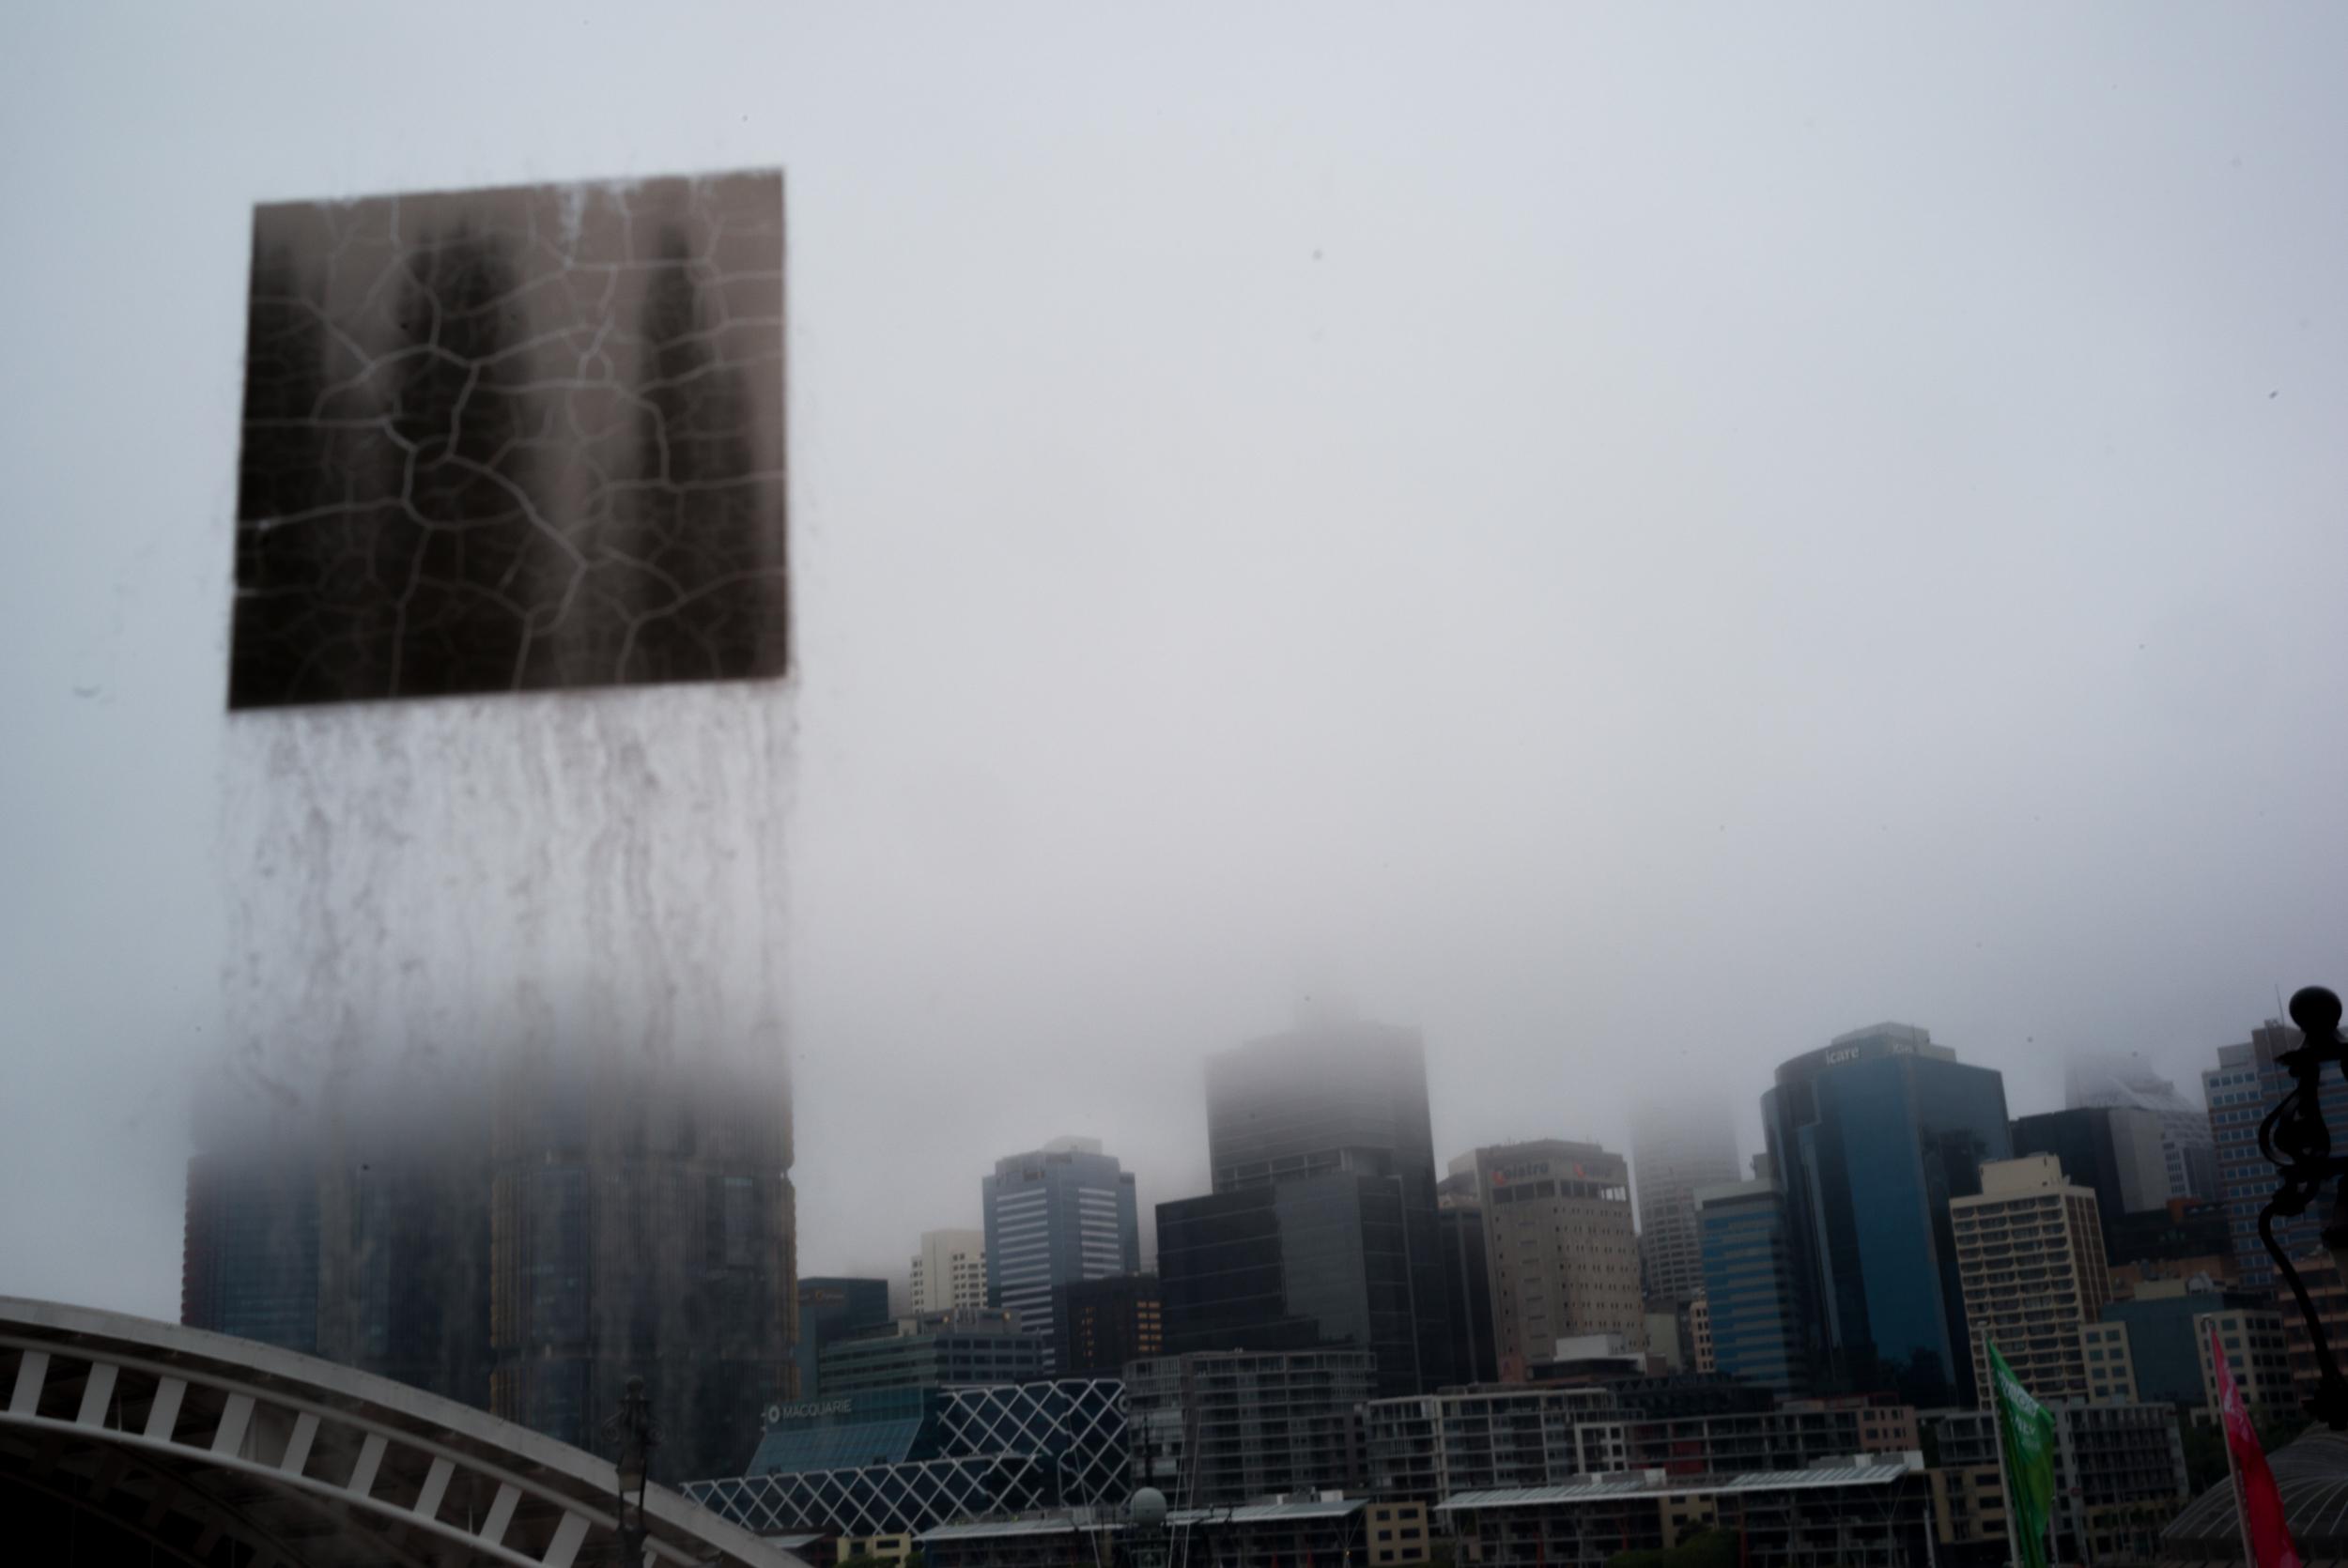 08_Jonathan_Pui_Australian_street_photography_fog_cityscape_aussie_street.JPG